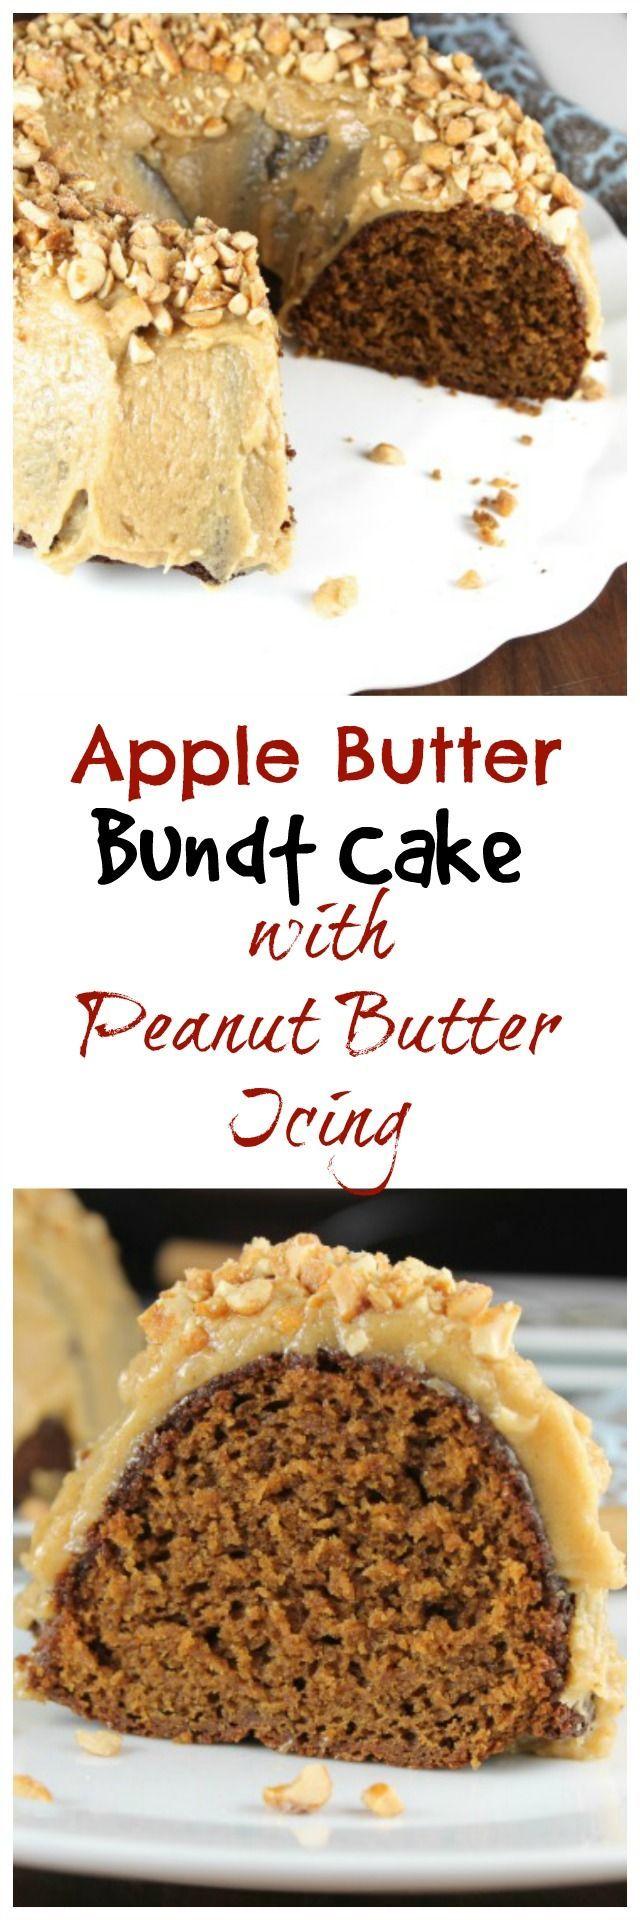 Apple Butter Bundt Cake with Peanut Butter Icing Recipe